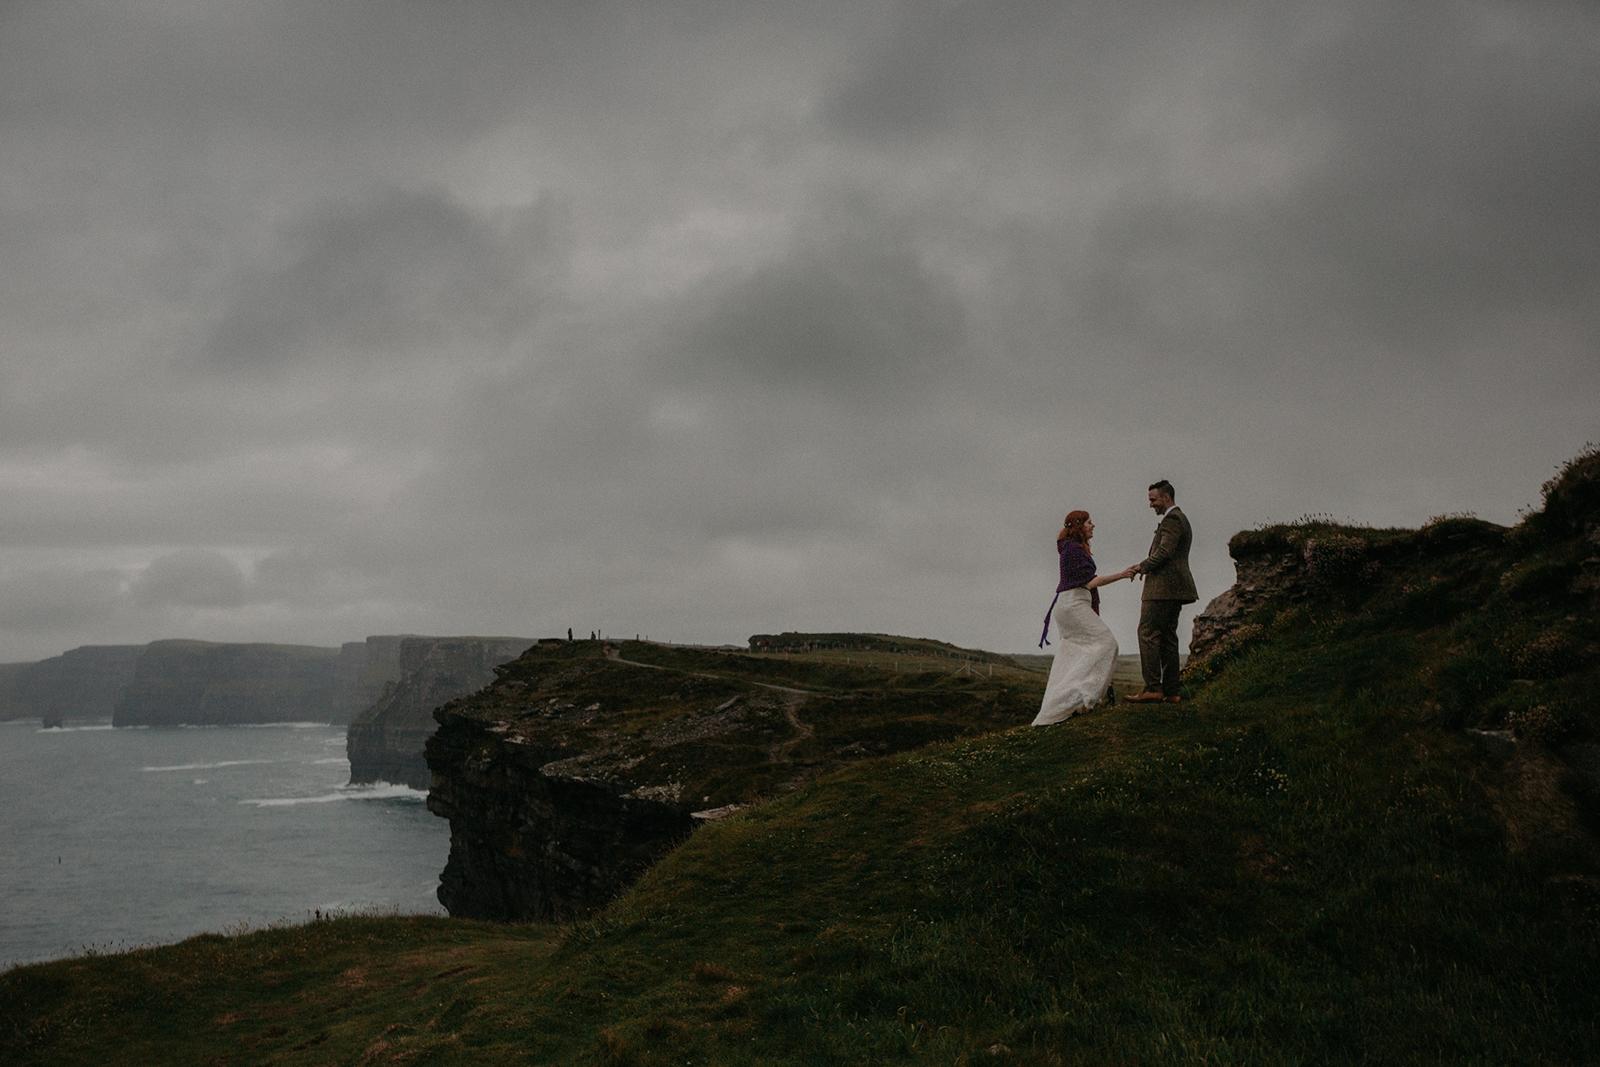 Cliffs of Moher Elopement, Cliffs of Moher Elopement in Ireland